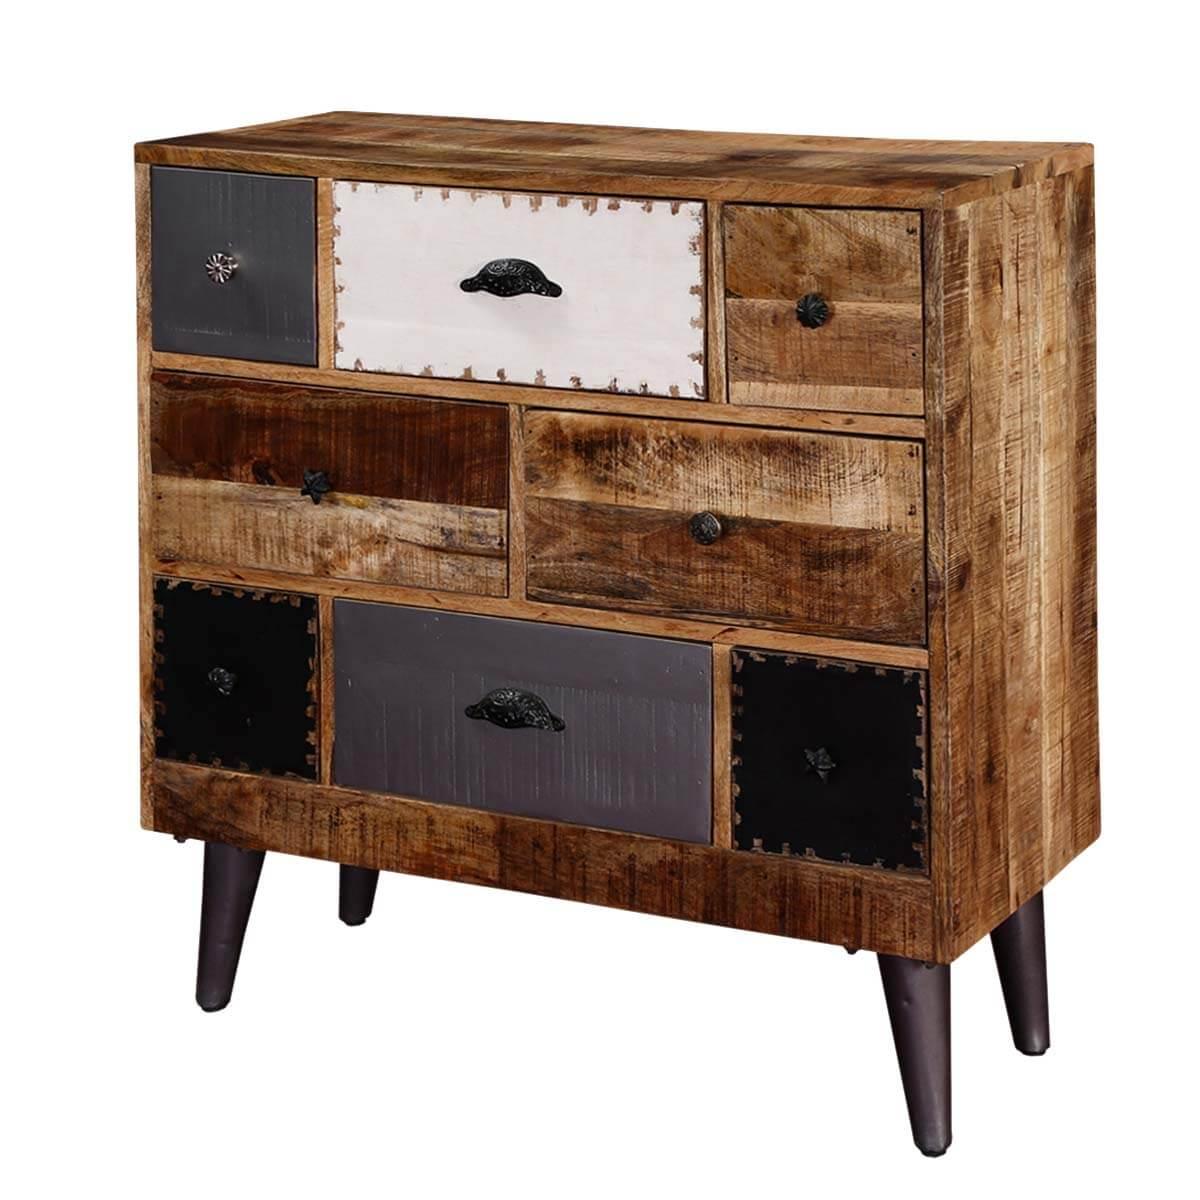 Rustic Mango Wood Accent Industrial Dresser Chest